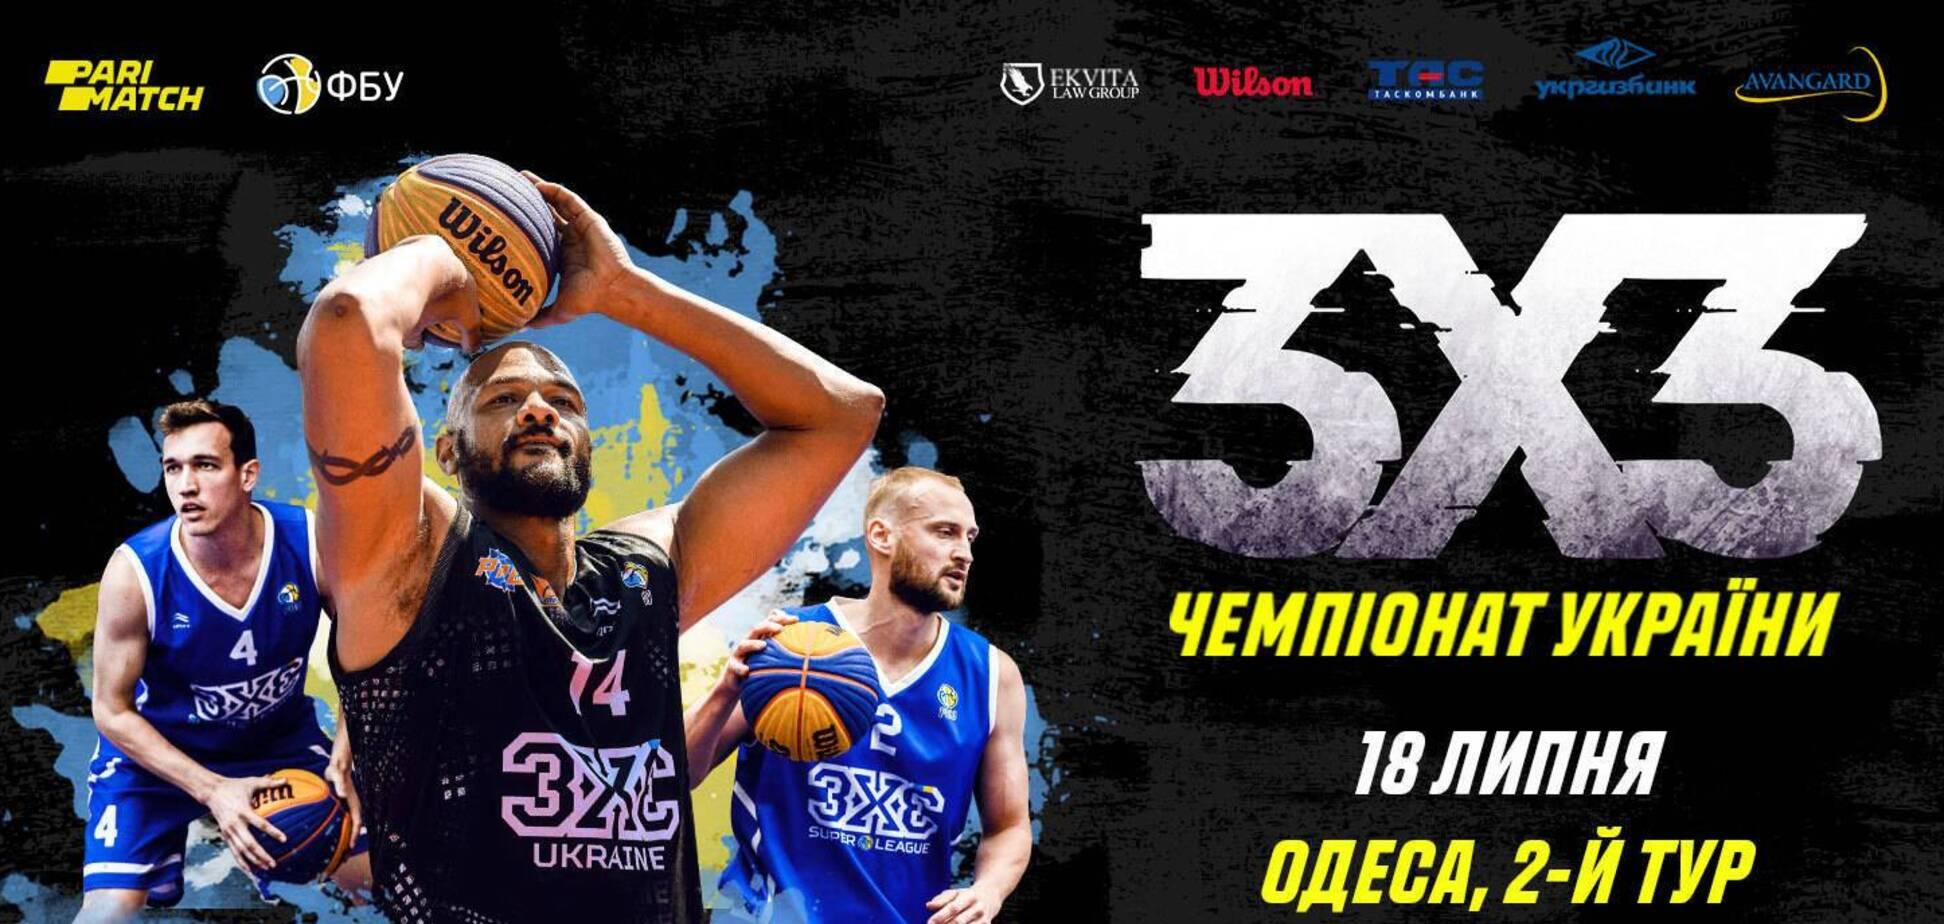 Чемпионат Украины по баскетболу 3х3